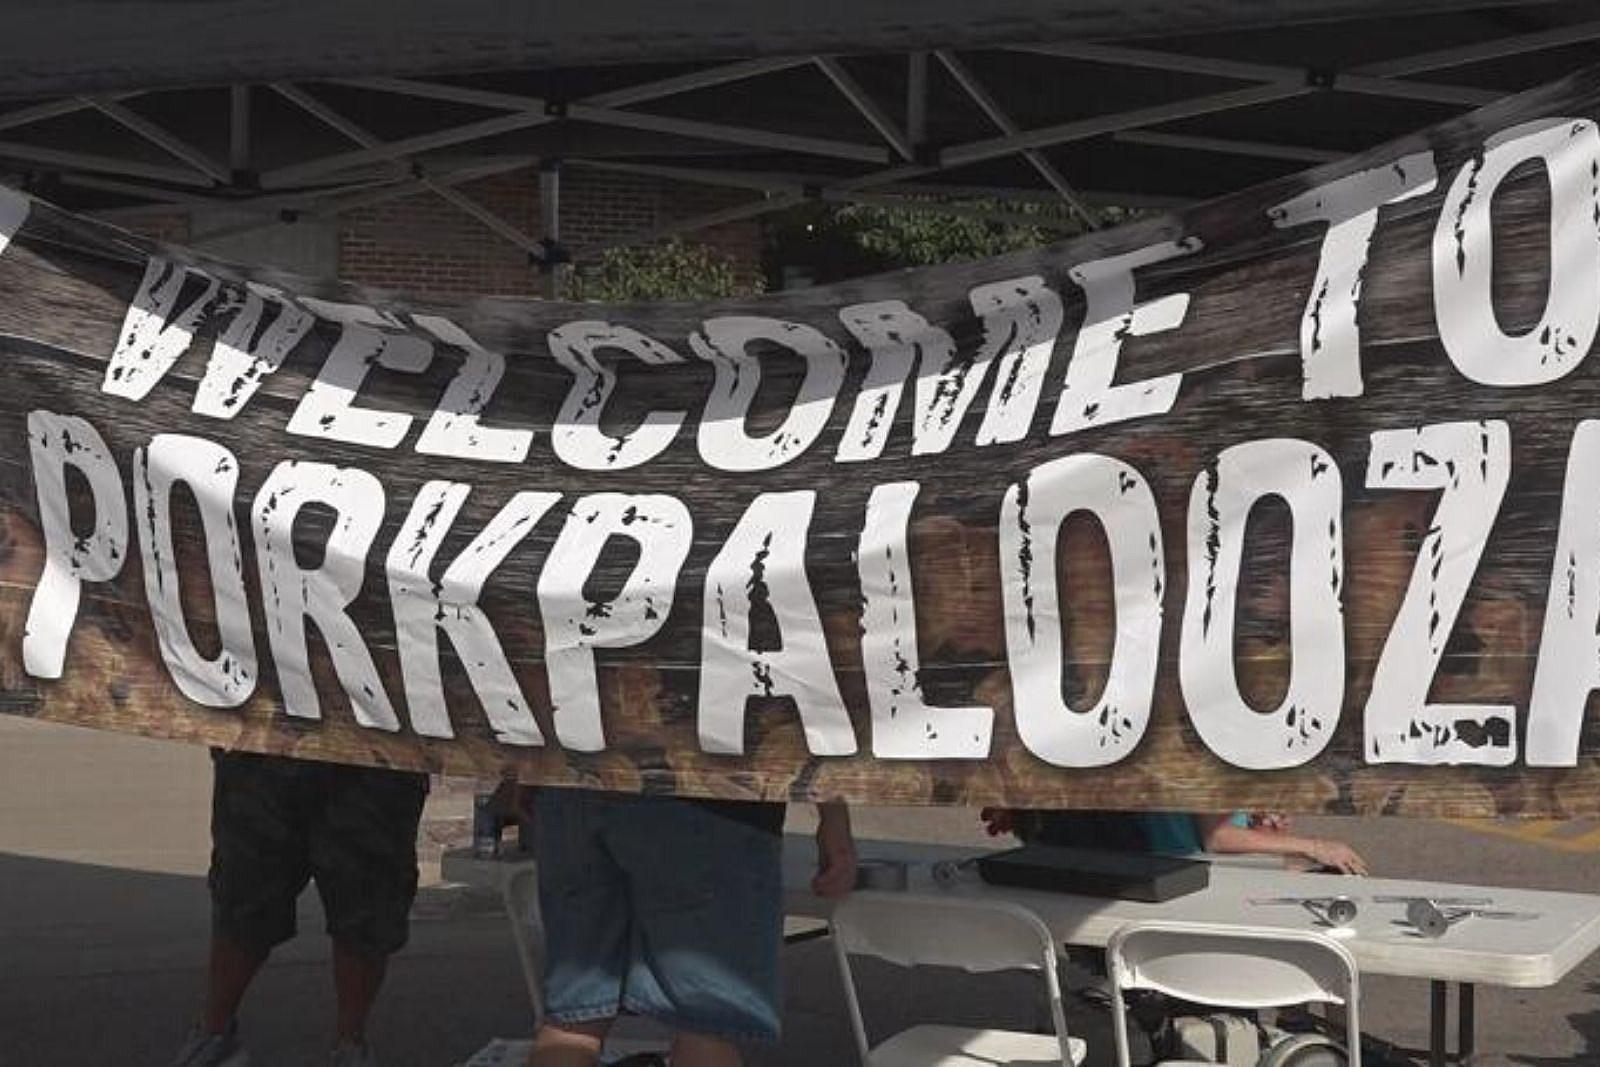 Sioux Falls Porkpalooza